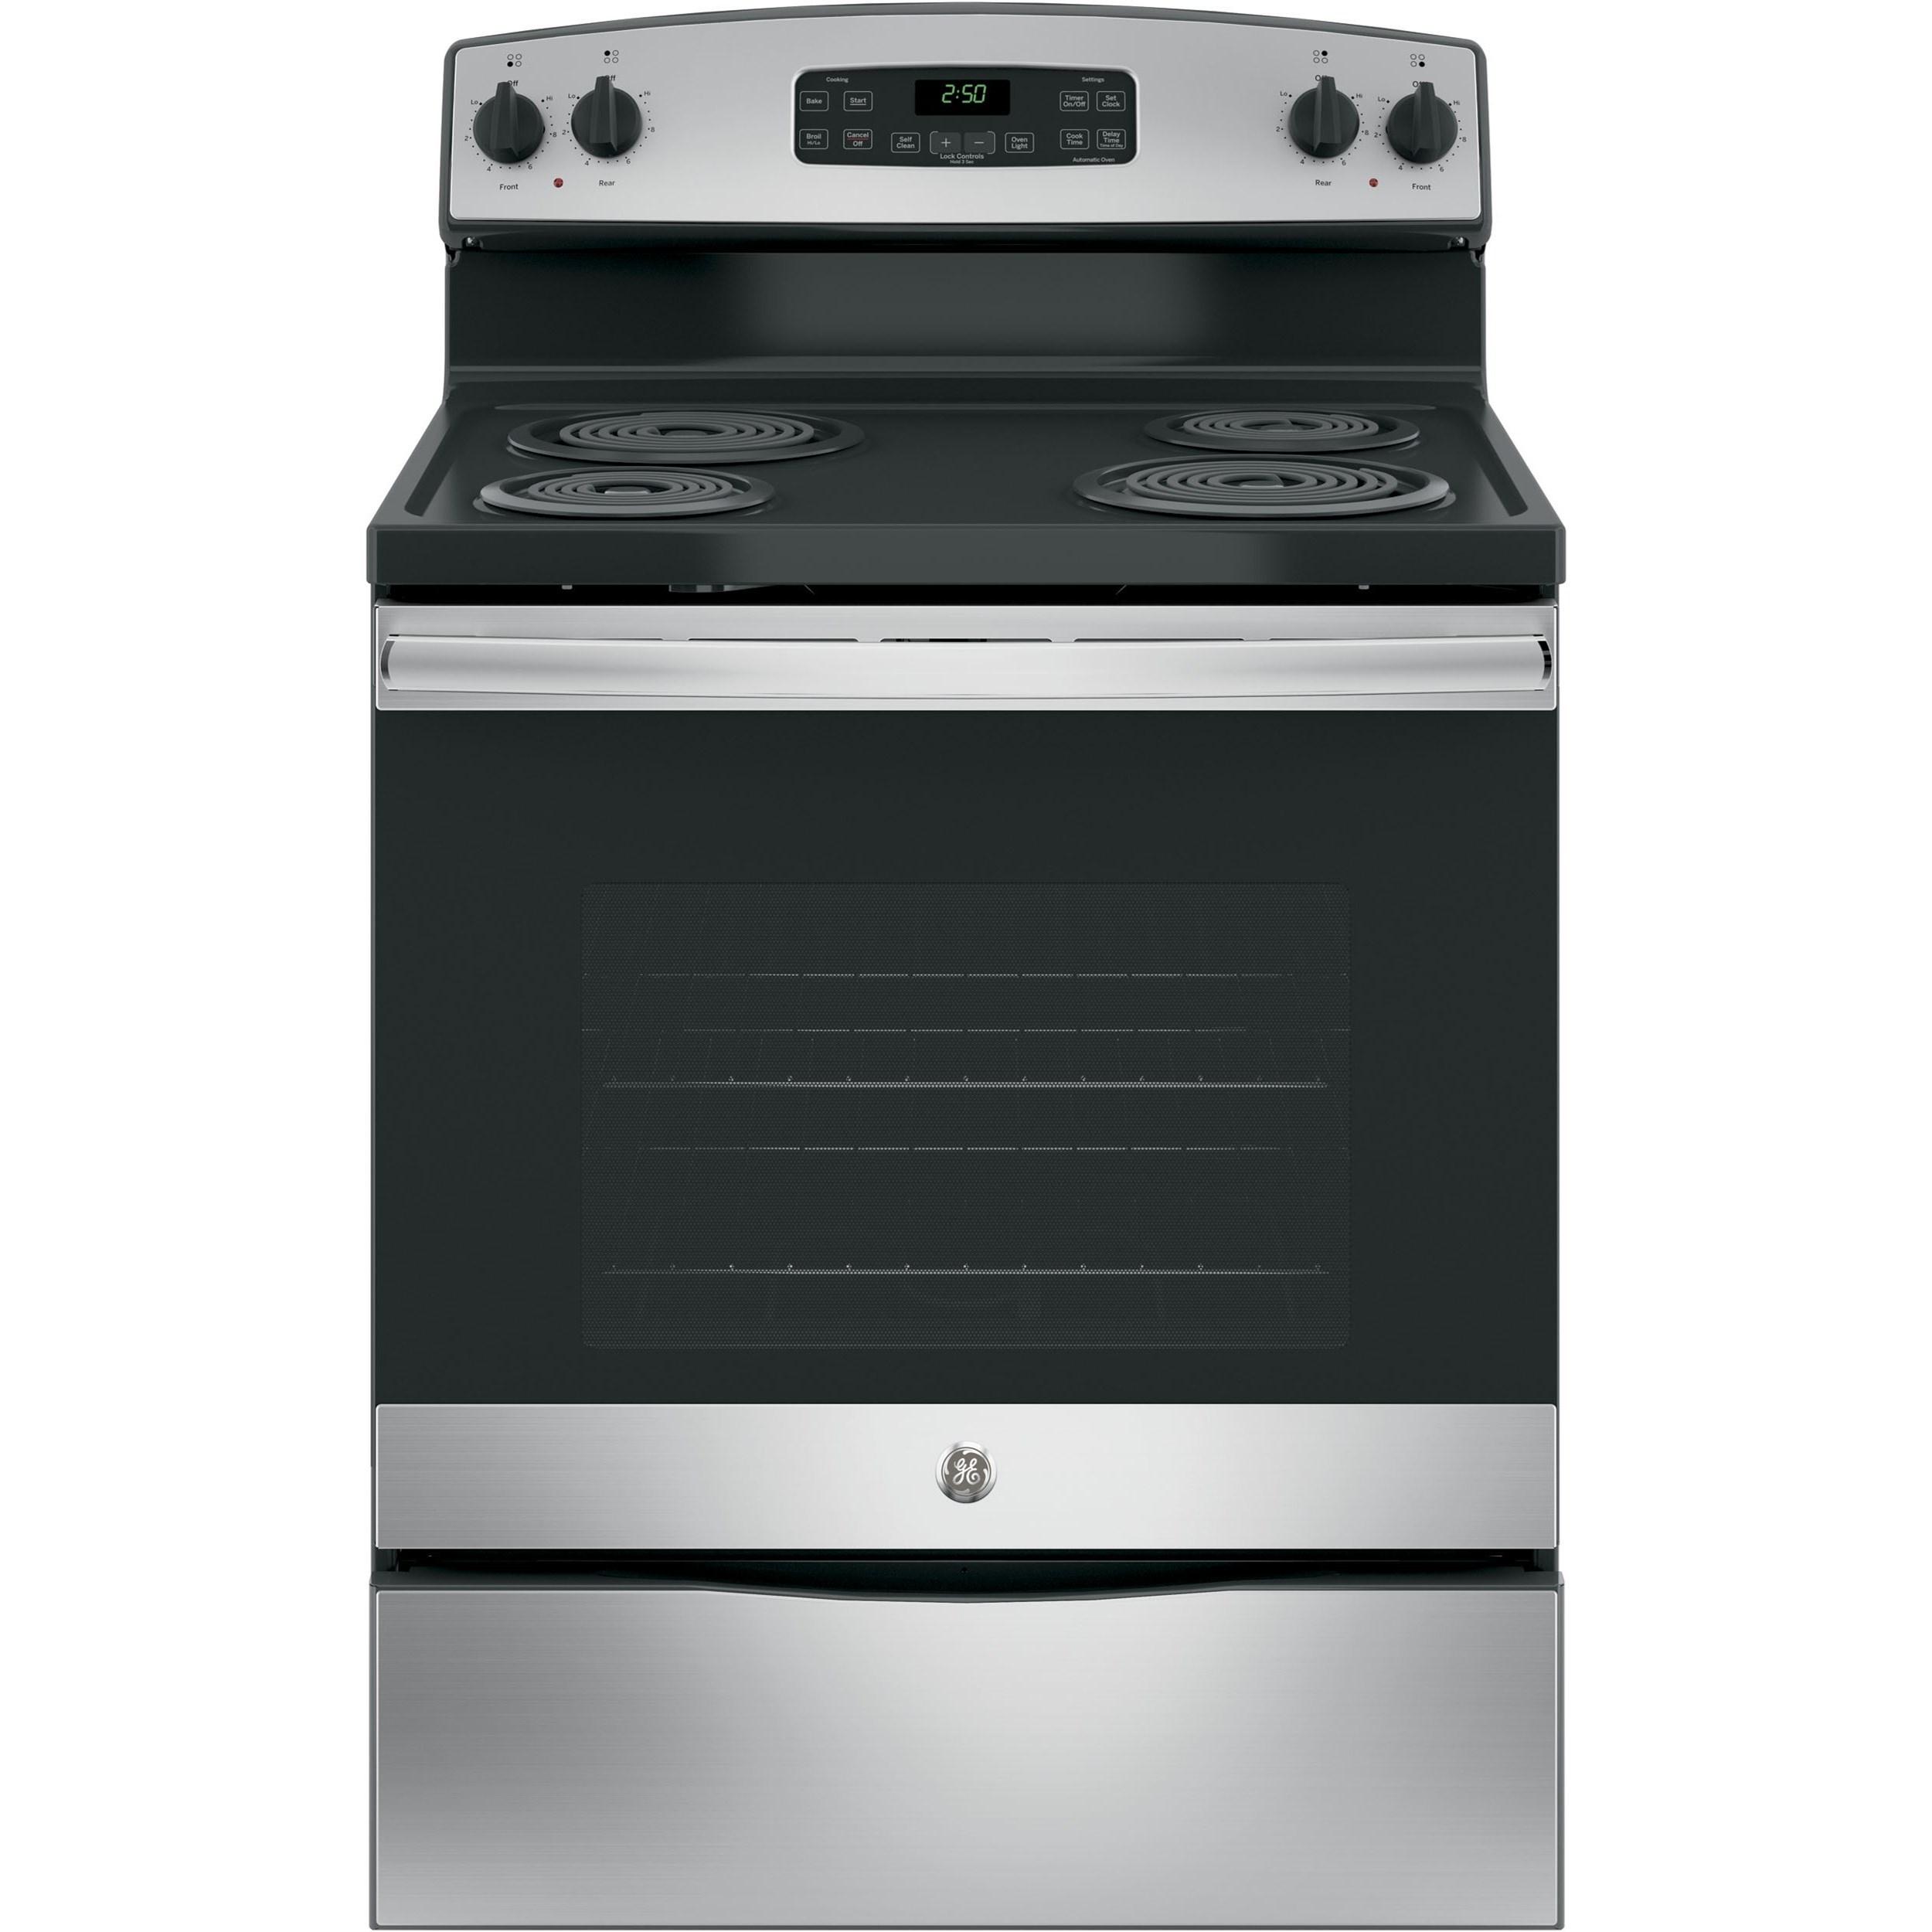 "GE Appliances GE Electric Ranges GE® 30"" Free-Standing Electric Range - Item Number: JB250RKSS"